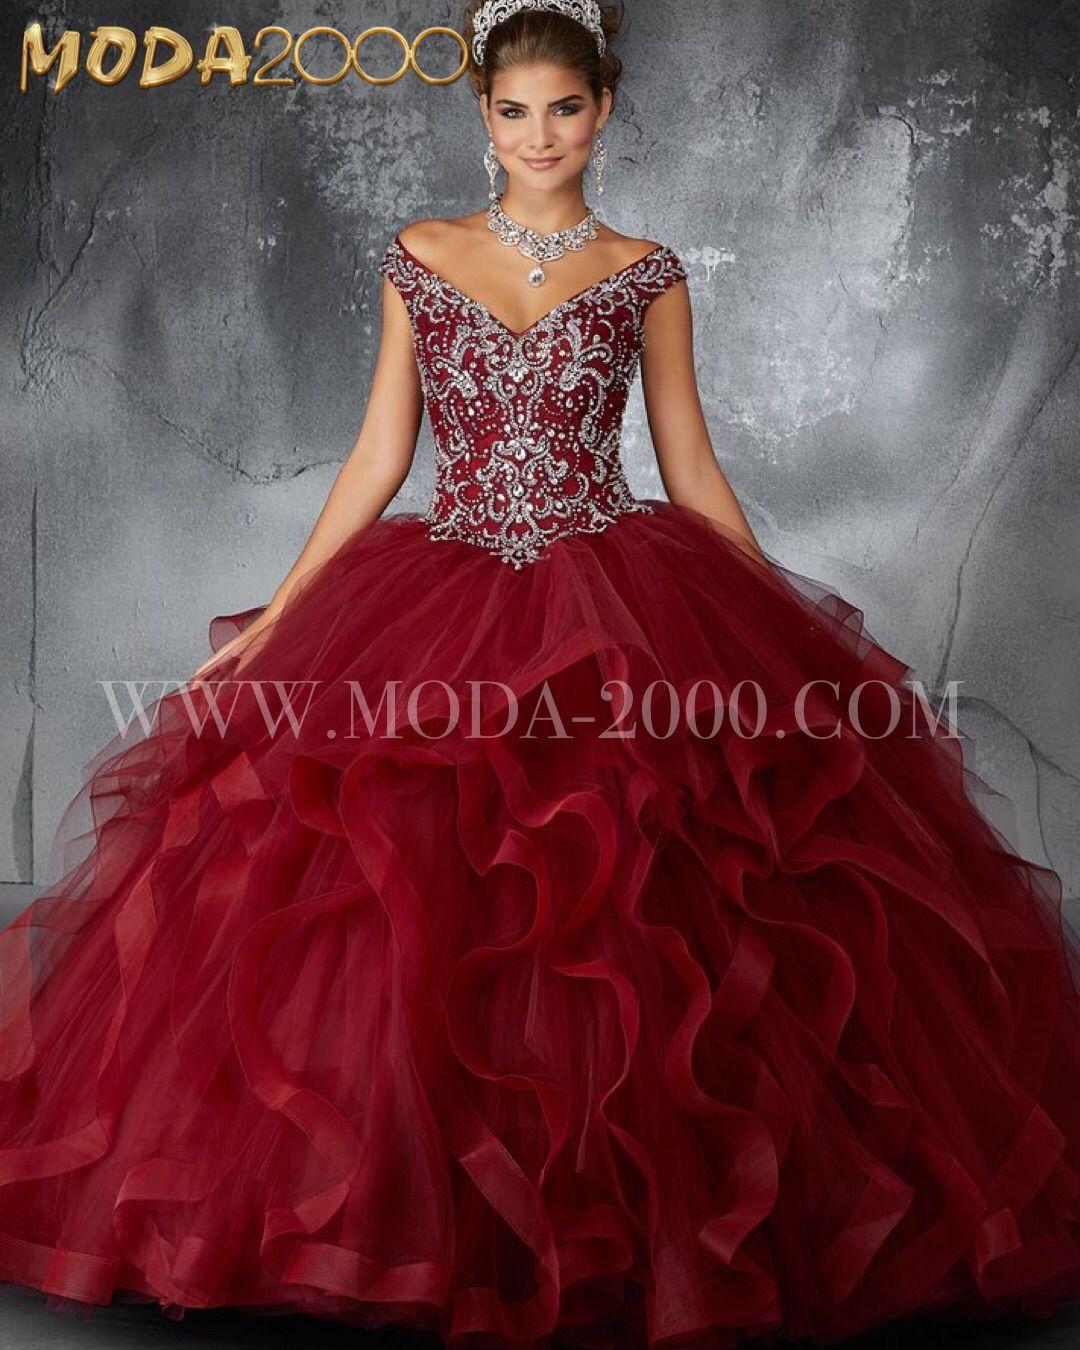 Sangria Burgandy Quinceanera Sweet16 Dress With Ruffles Pretty Girl Dresses Quince Dresses Quinceanera Dresses [ 1350 x 1080 Pixel ]